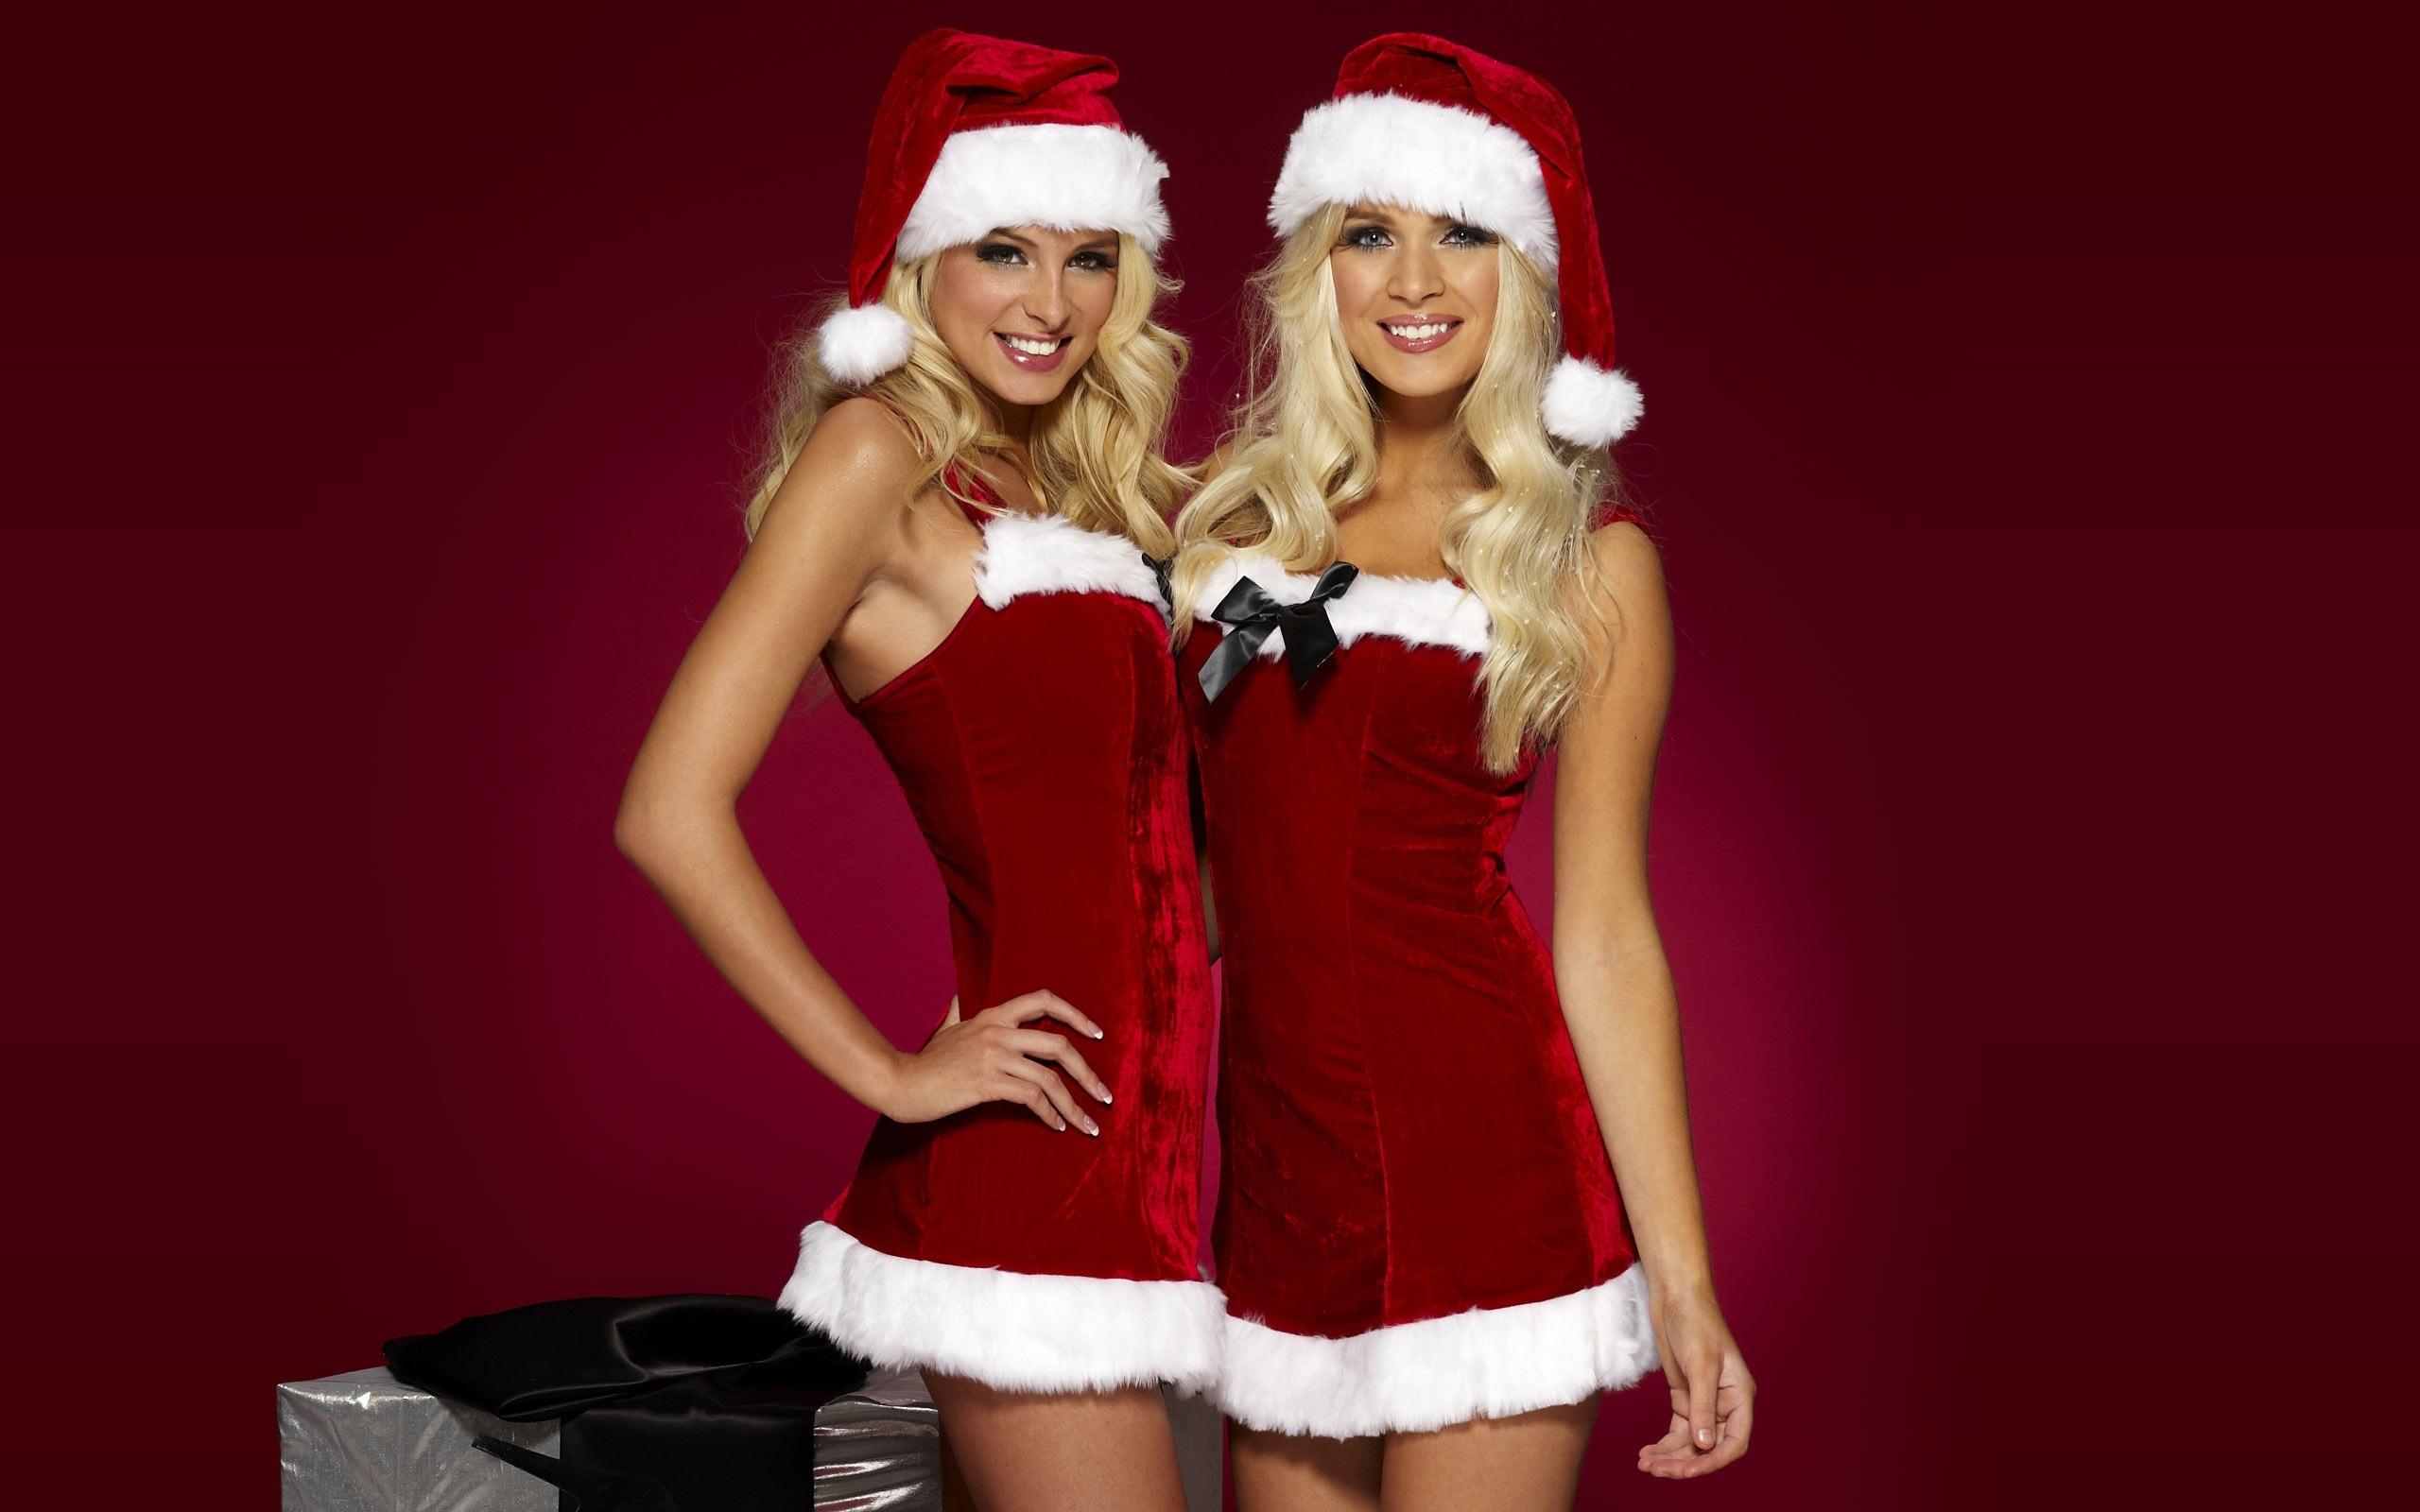 Сучка позирует на Рождество перед елкой  444113